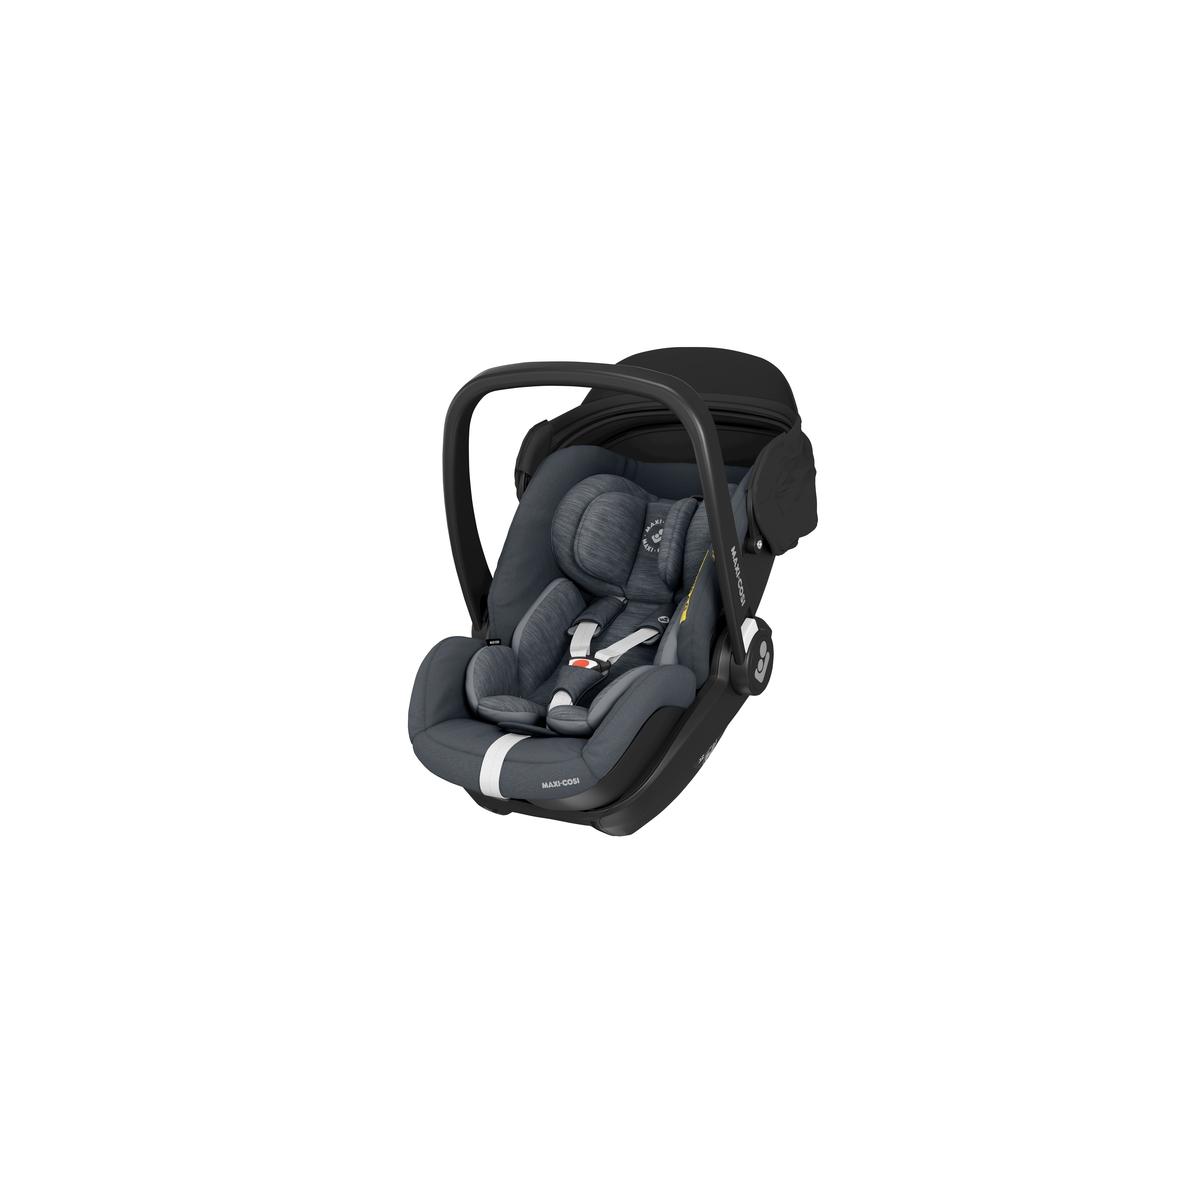 Maxi Cosi Marble i-Size Car Seat-Essential Graphite (NEW)